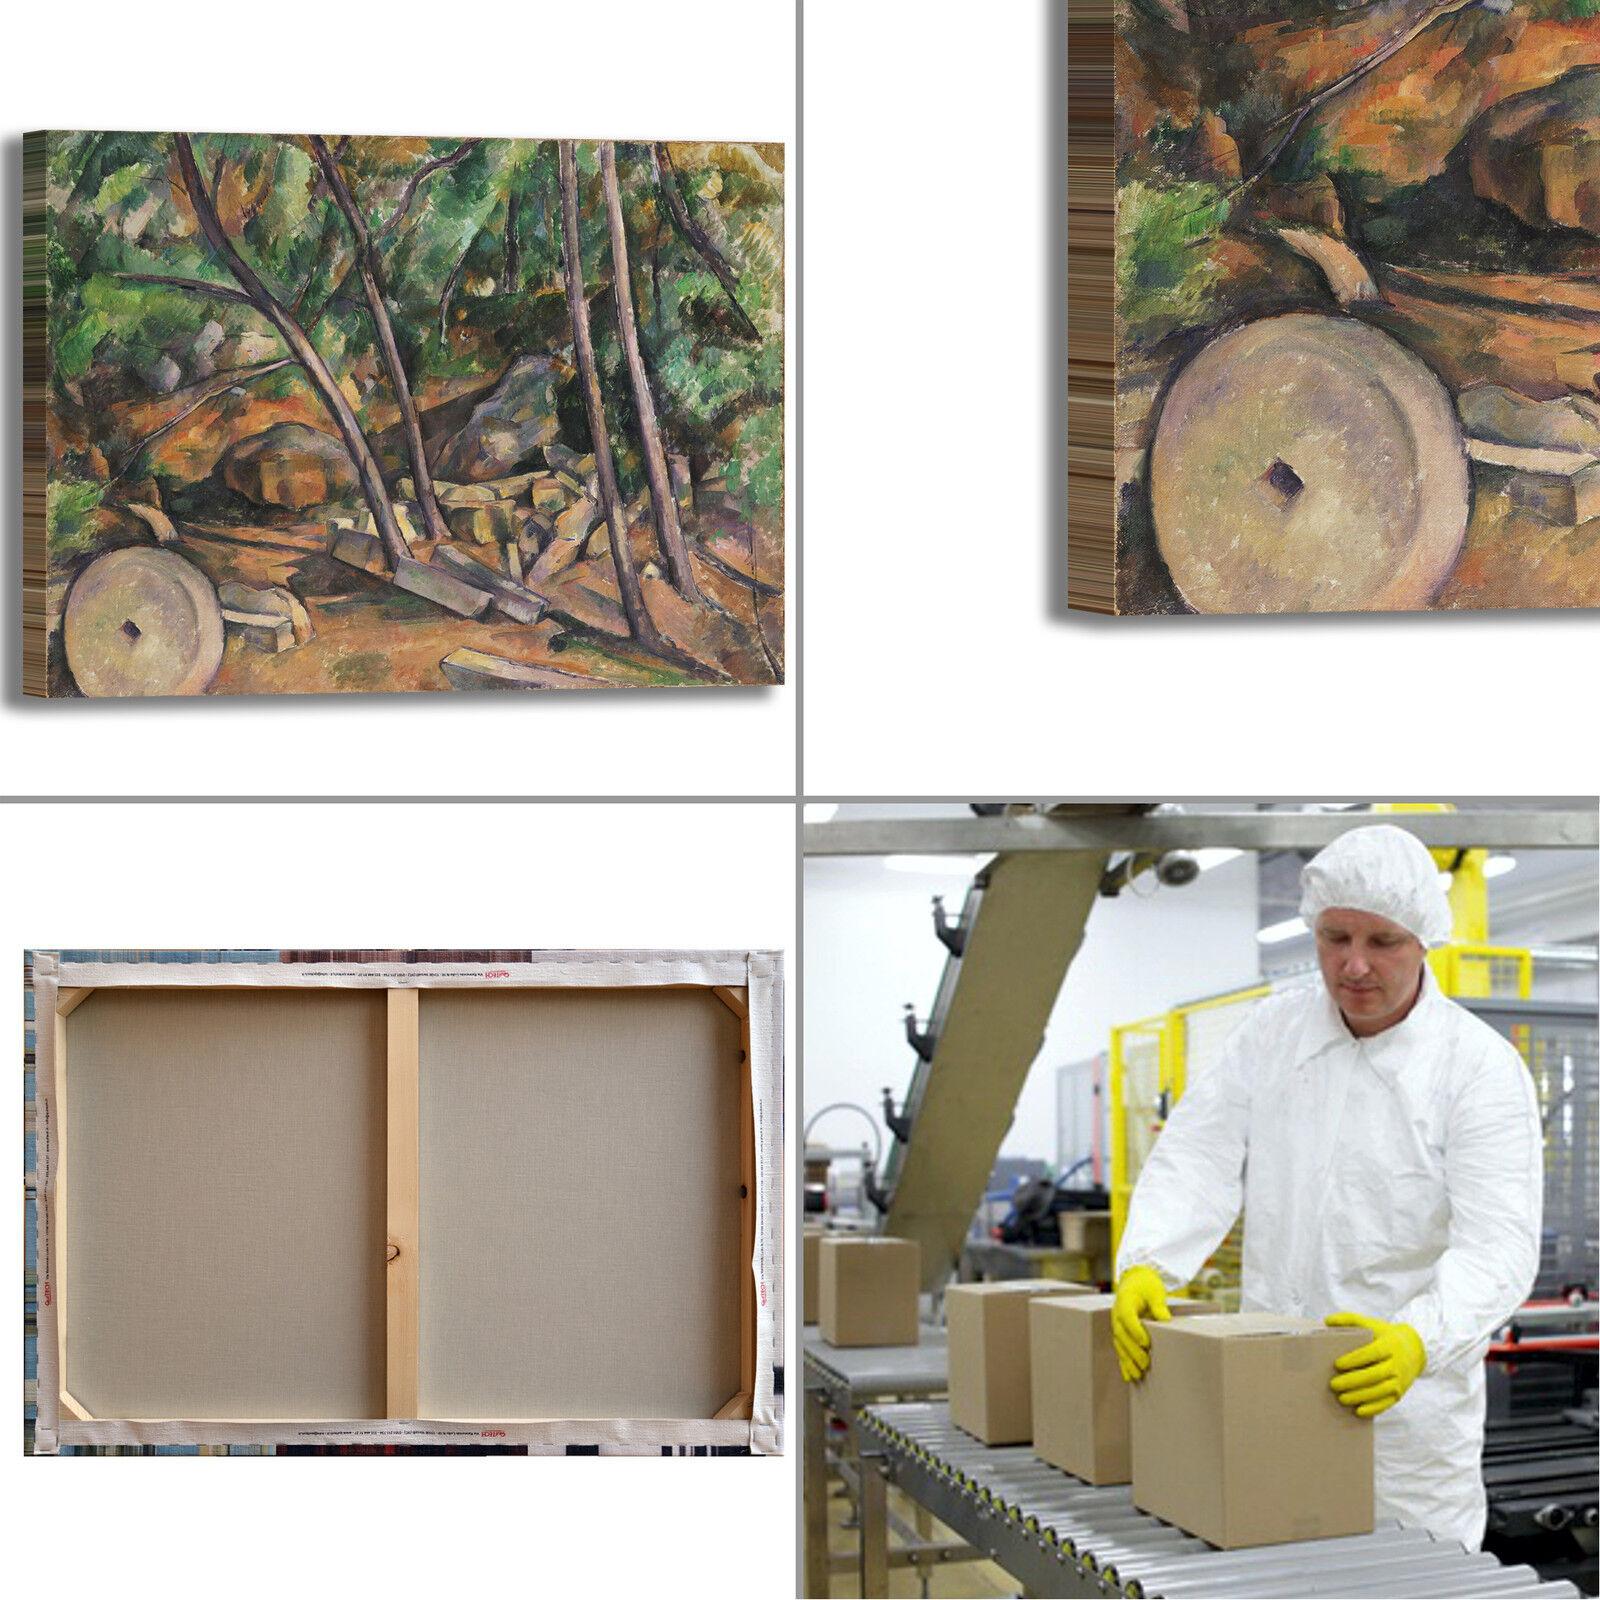 Cezanne macina nel parco parco parco design quadro stampa tela dipinto telaio arRouge o casa   Stocker  3075f9